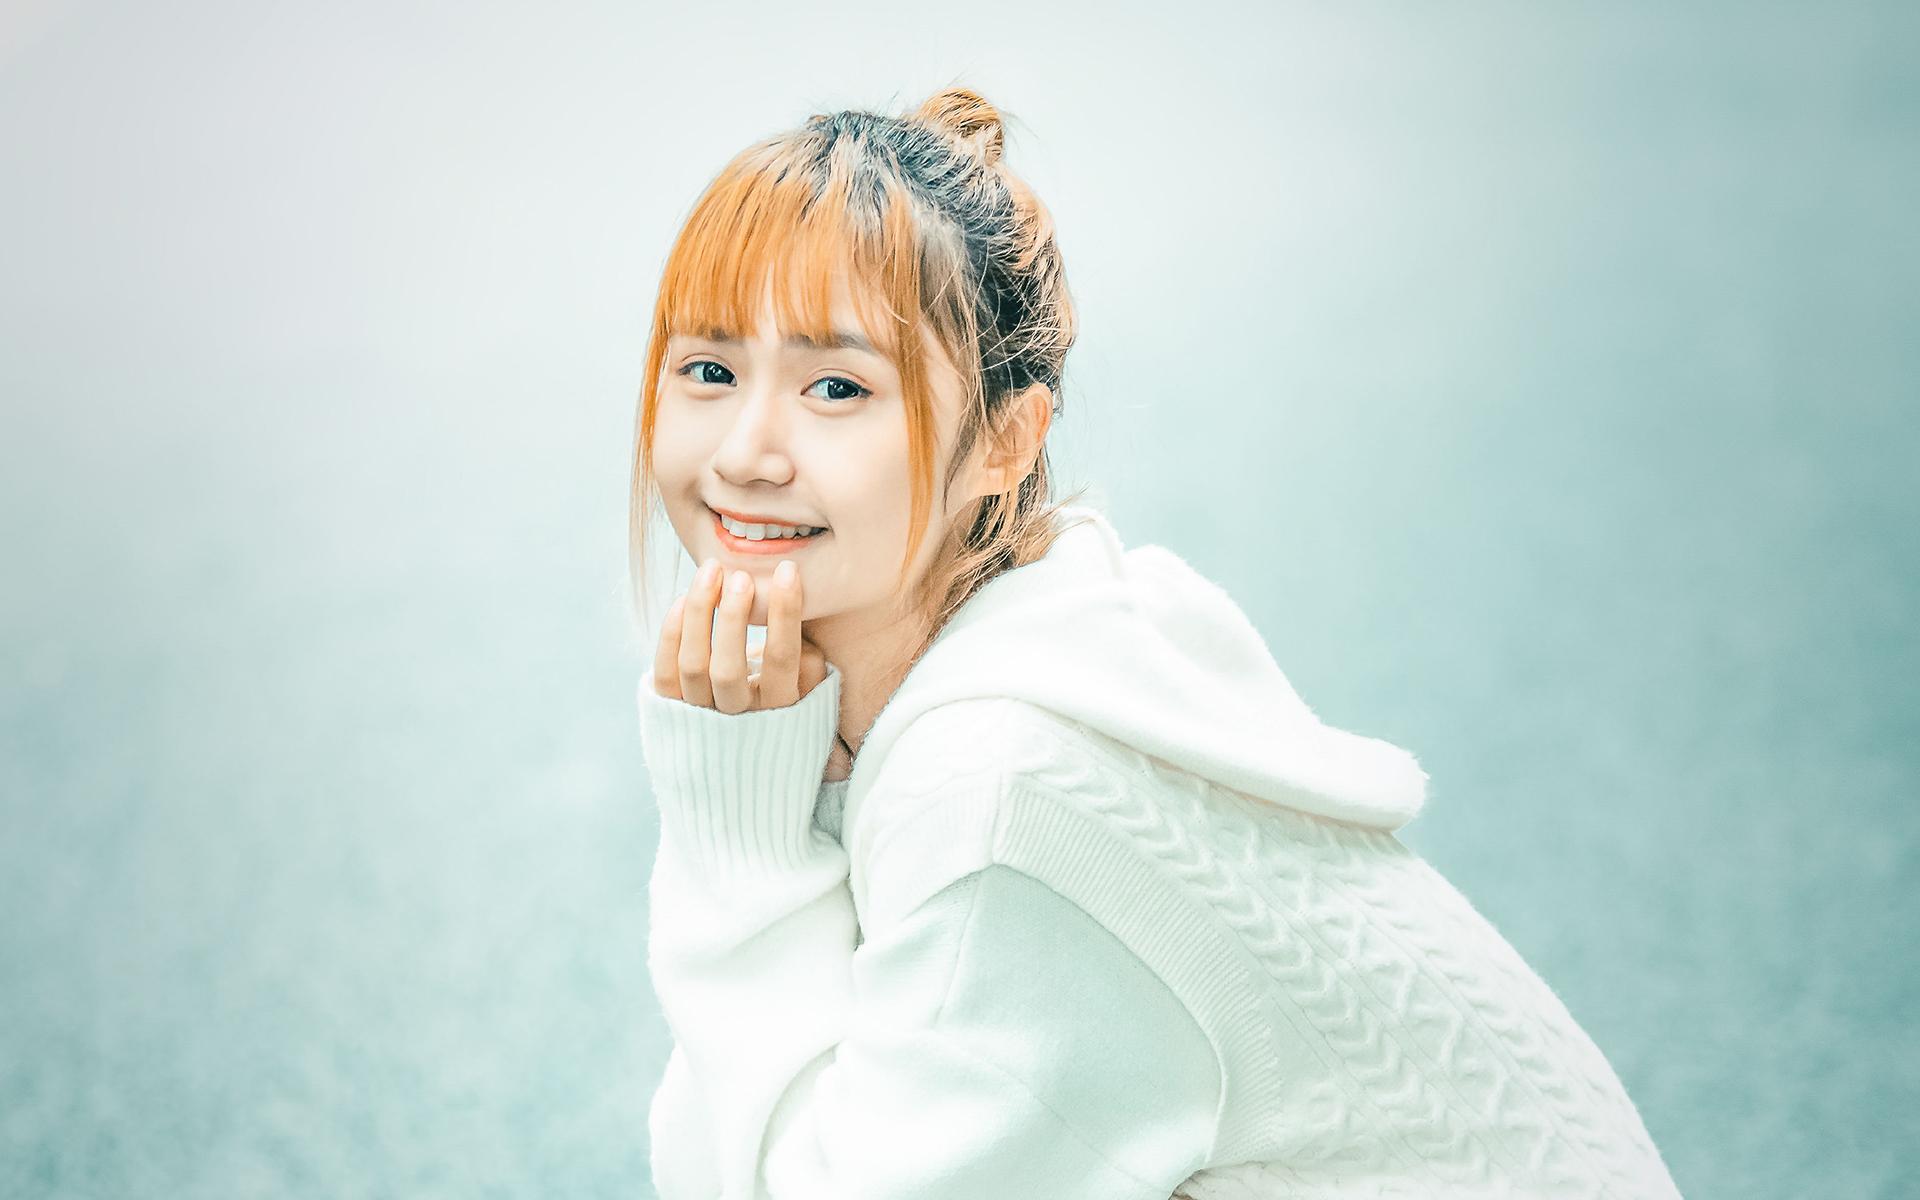 yw193can久草o优物视频会科普生活常识吗